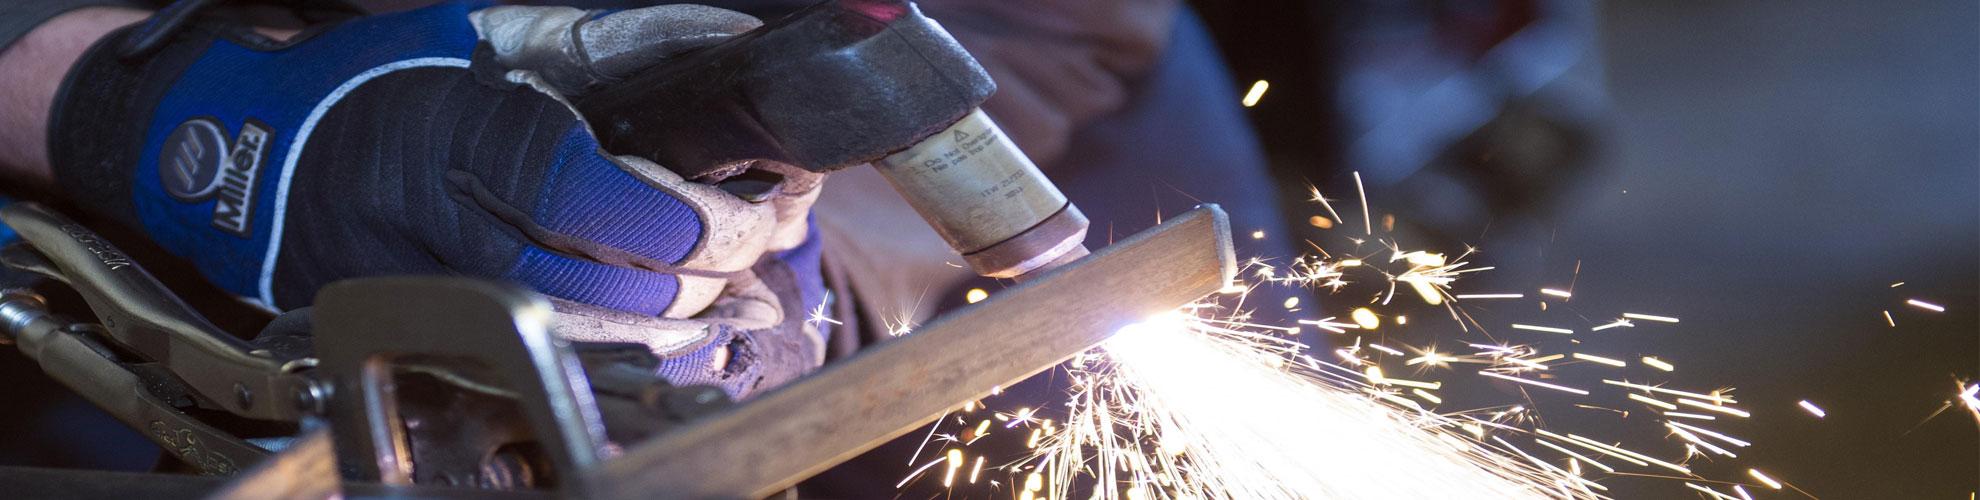 Arizona Custom welding and metal fabrication creating ornamental iron designs